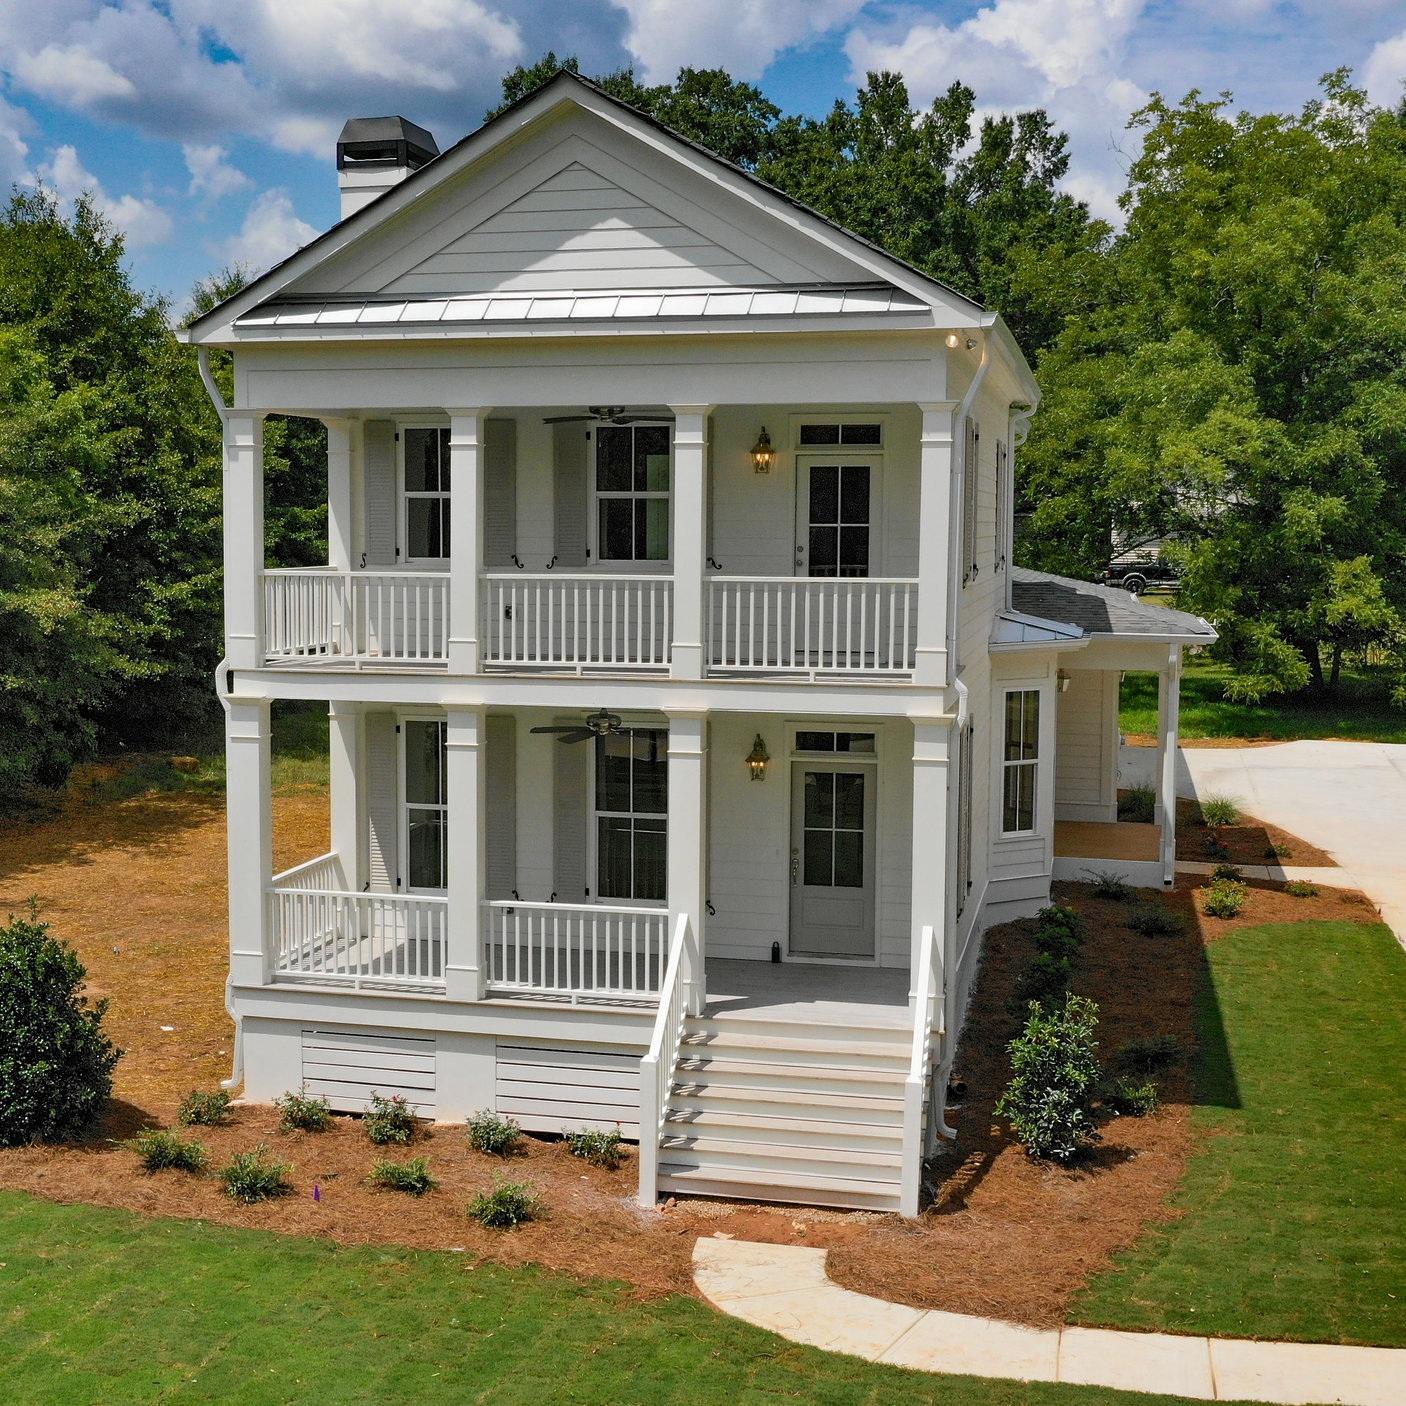 Seavy Street Farmhouse   4 Beds 3.5 Baths 2,179 SQFT  Senoia, GA